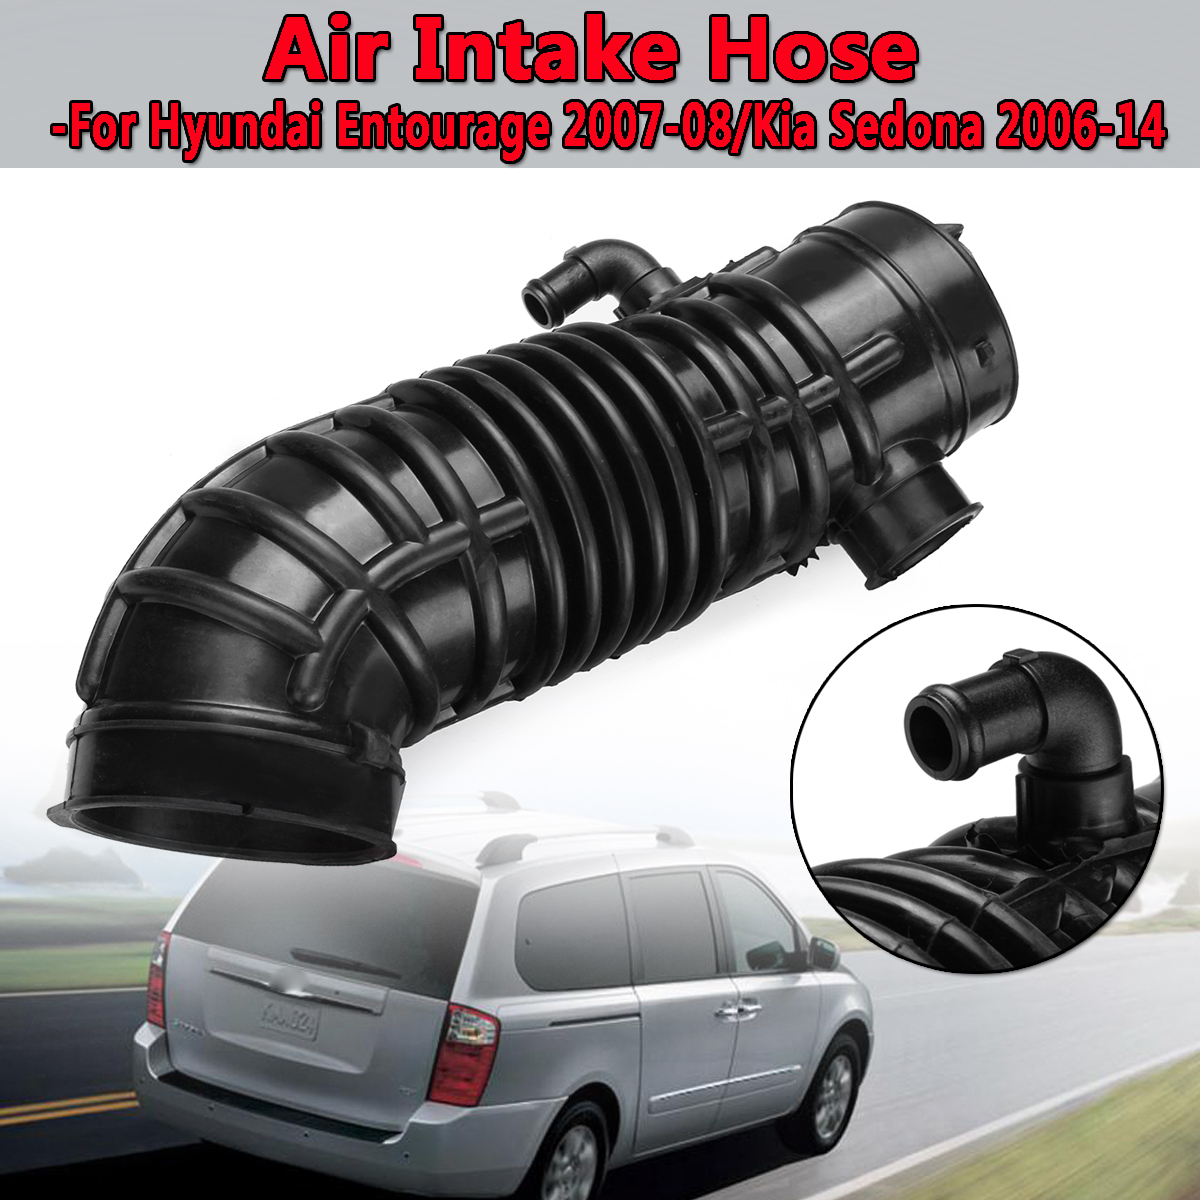 hight resolution of engine car air intake hose pipe for hyundai entourage 2007 2008 for kia sedona 2006